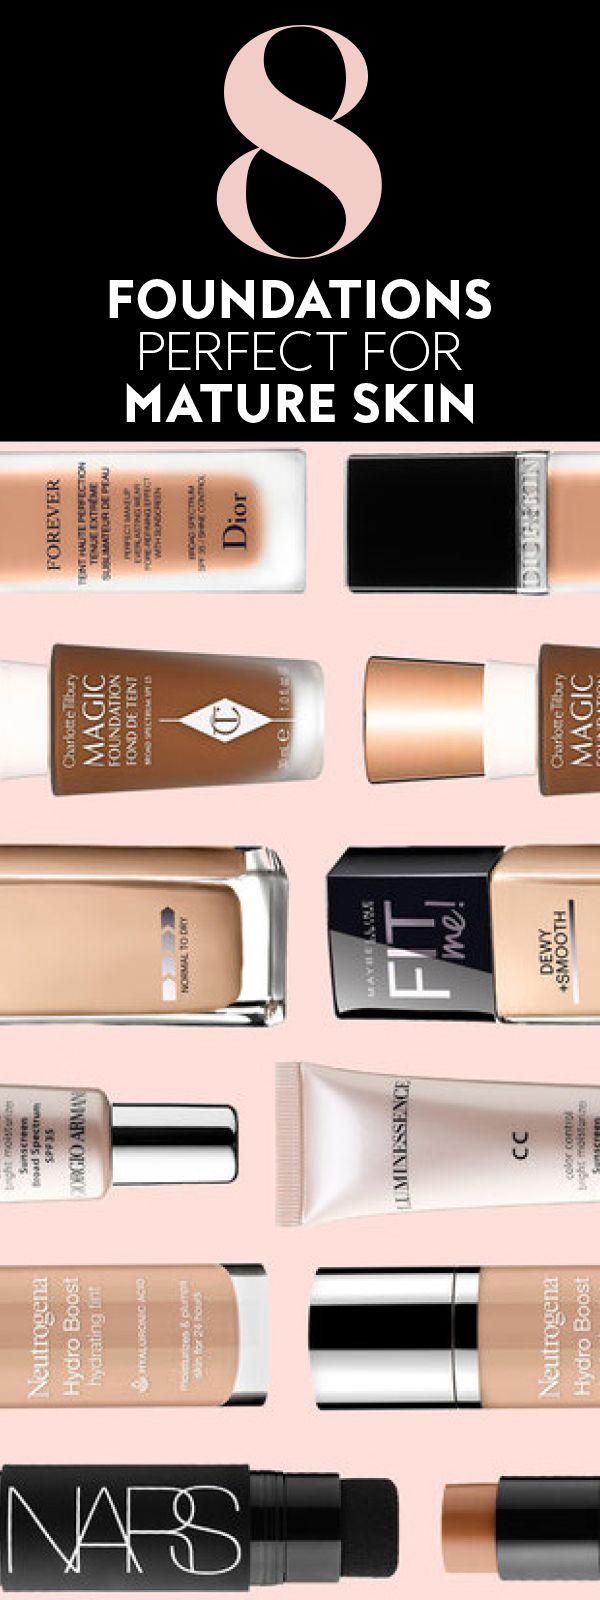 Foundation makeup for mature skin